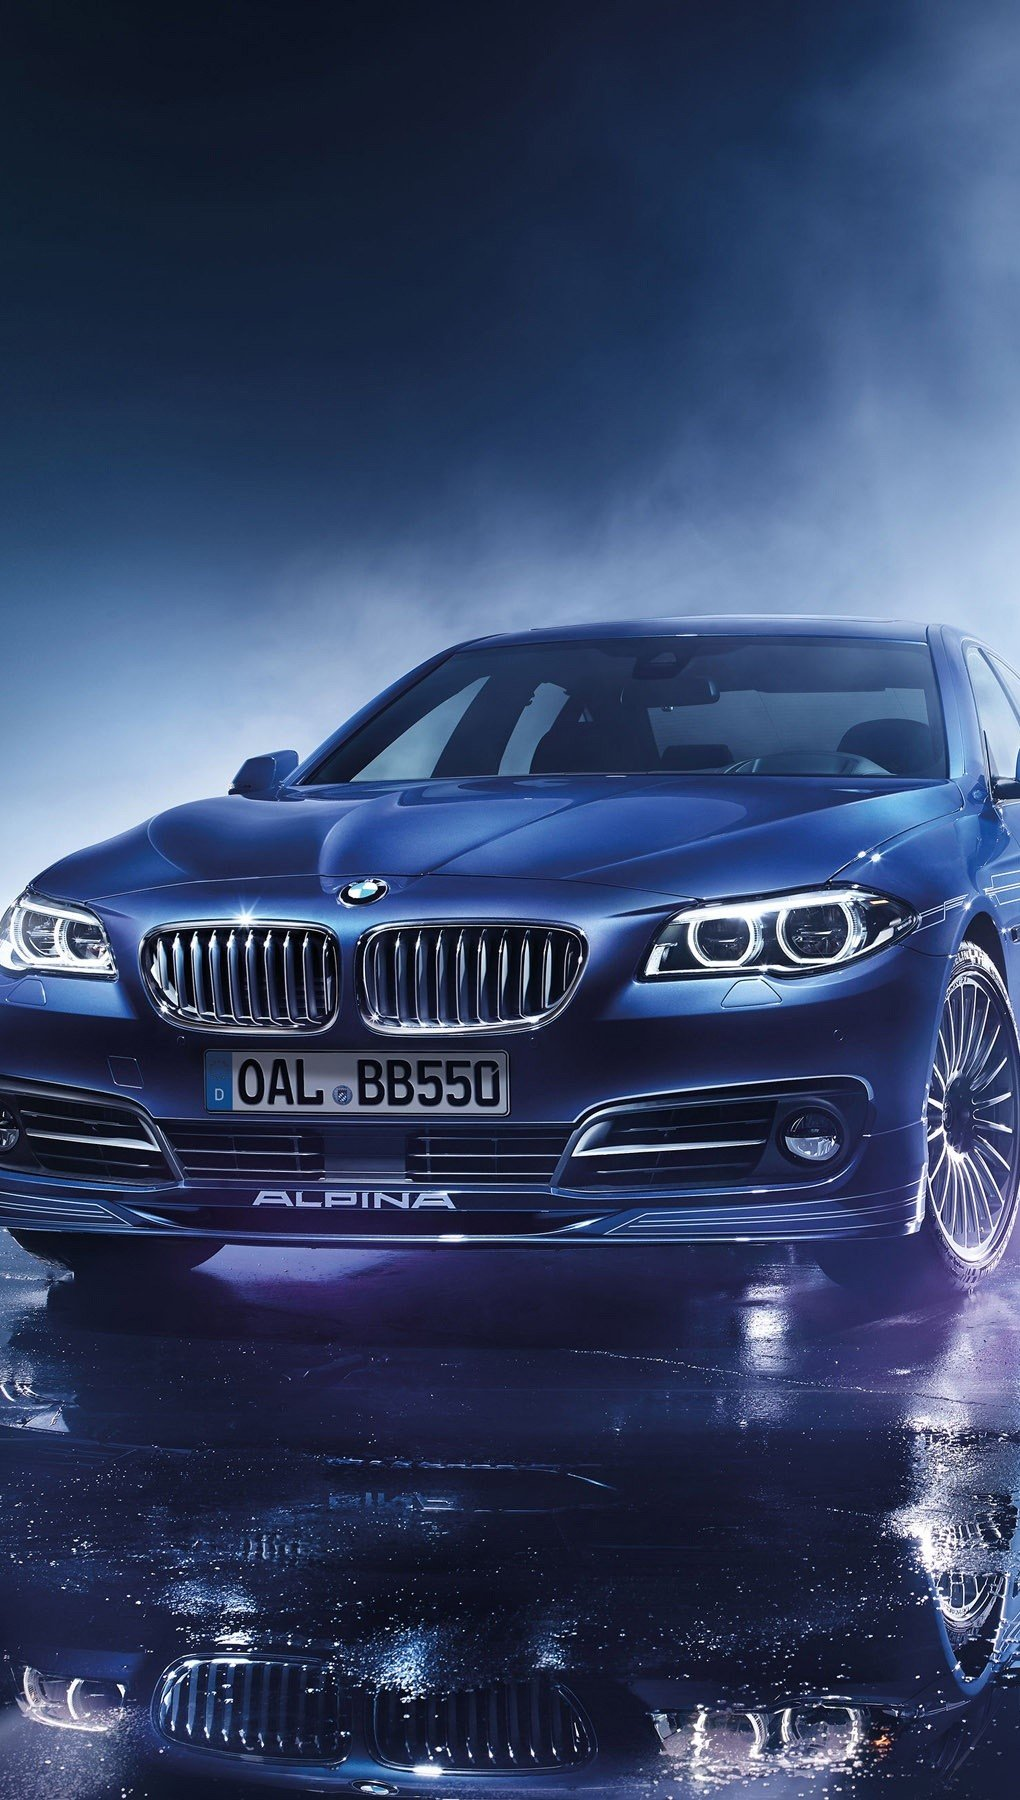 Wallpaper Alpina BMW B5 BI turbo edition Vertical